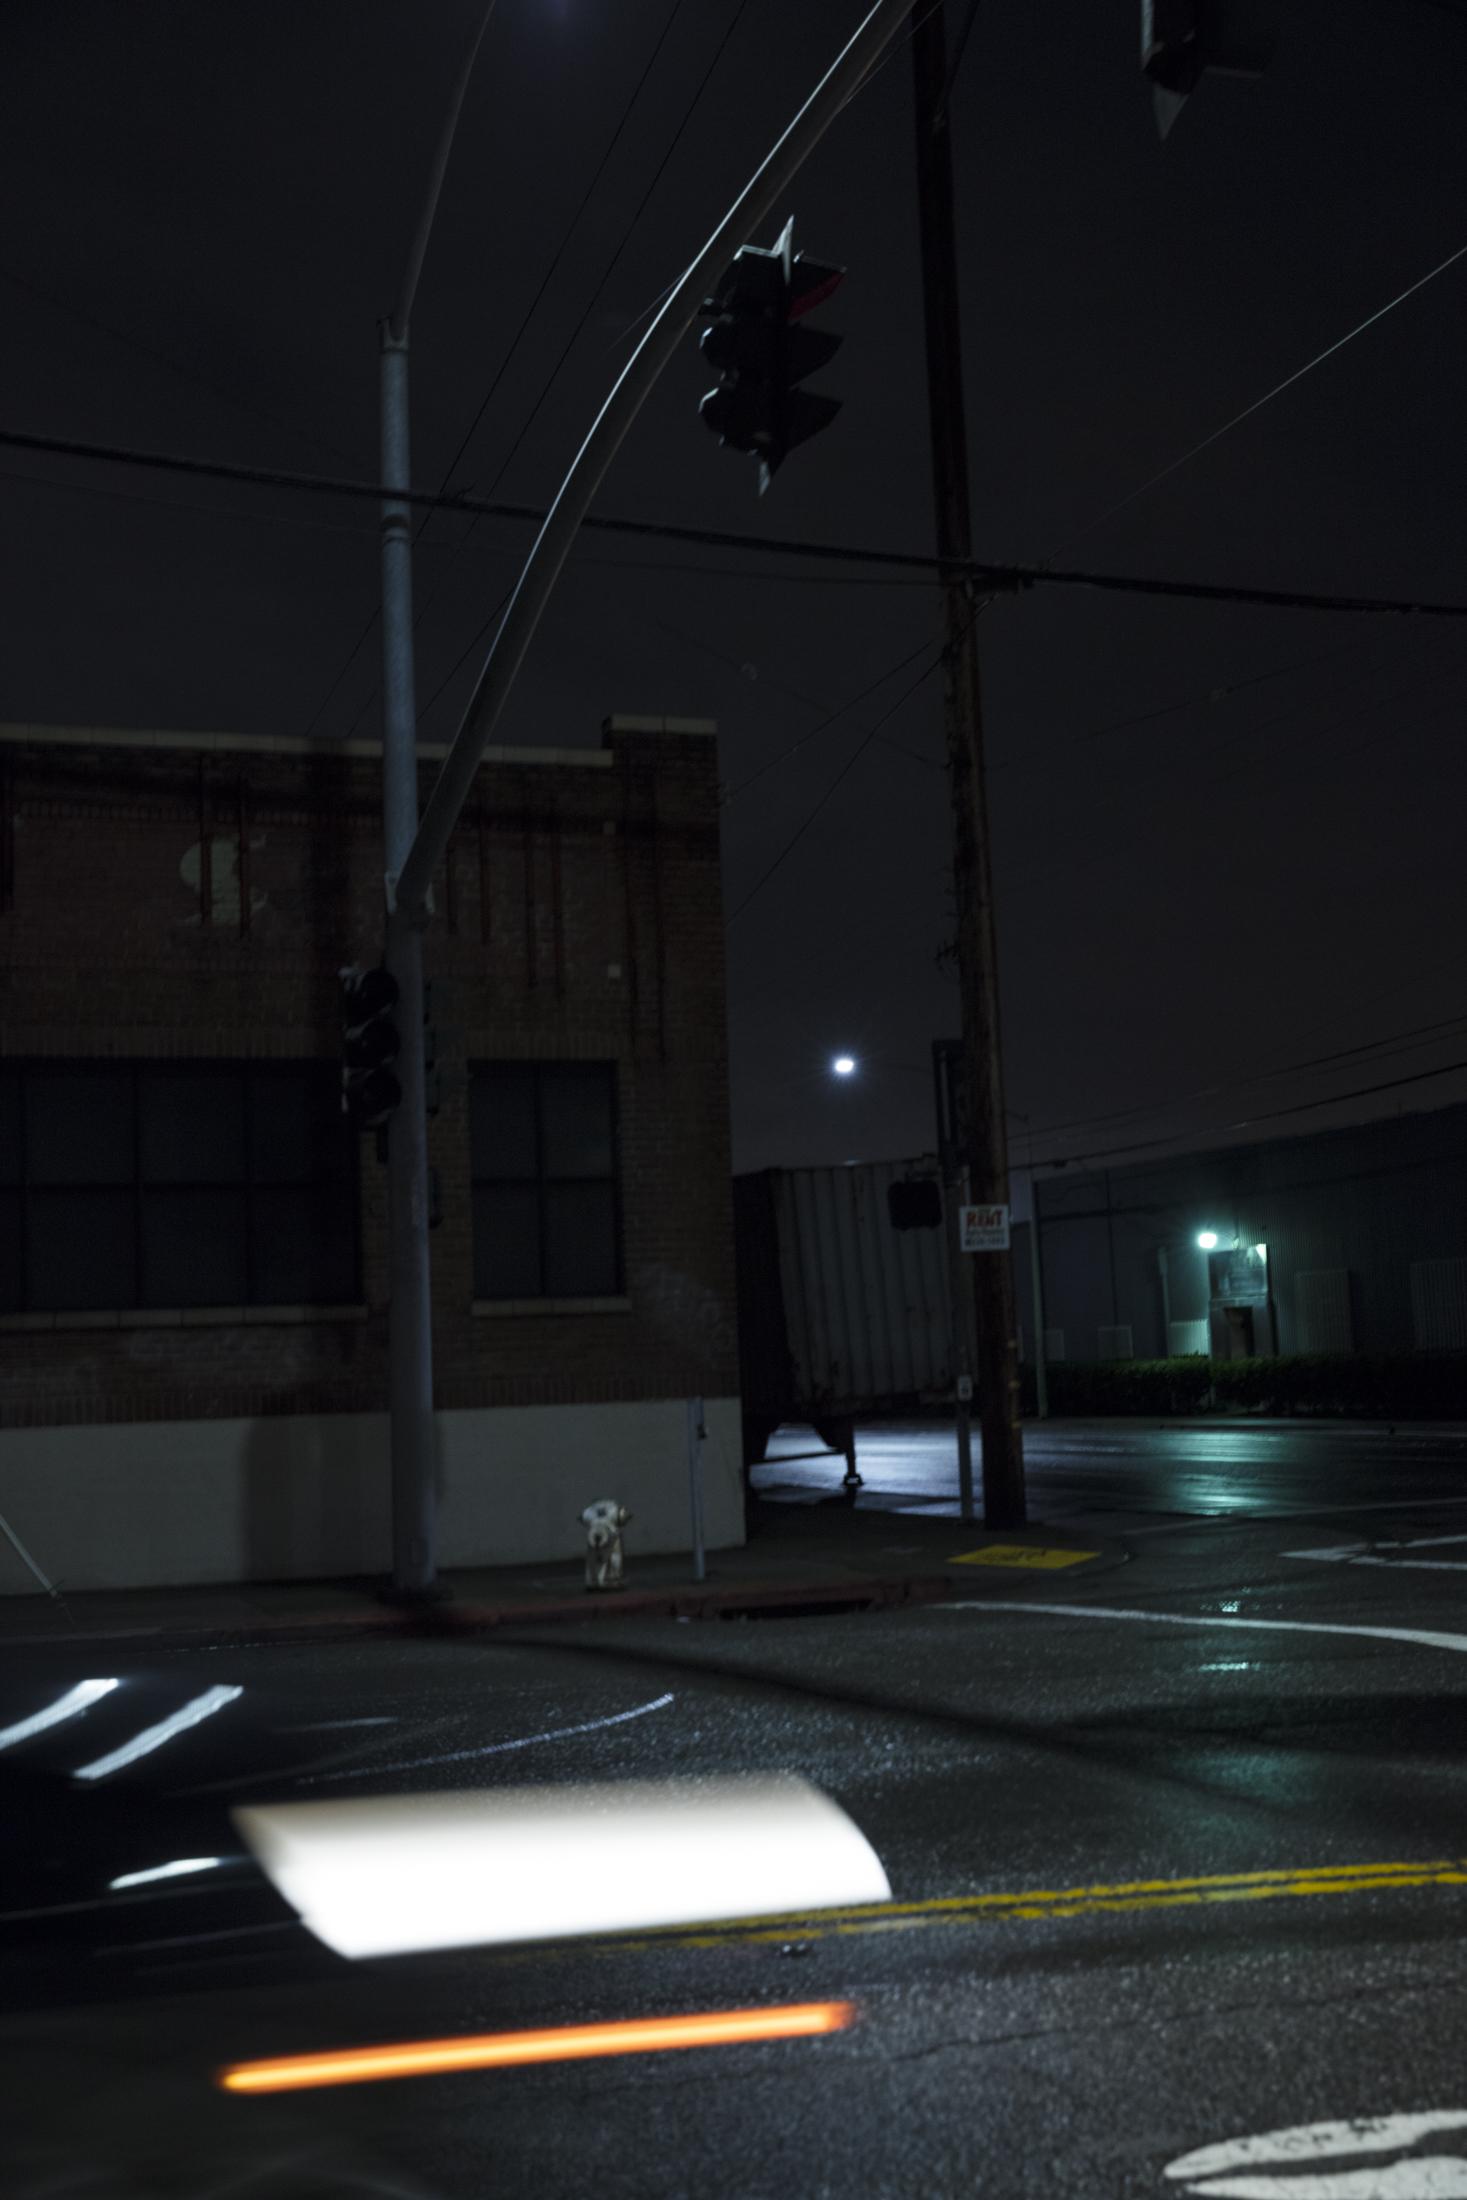 nightdrive-9.jpg